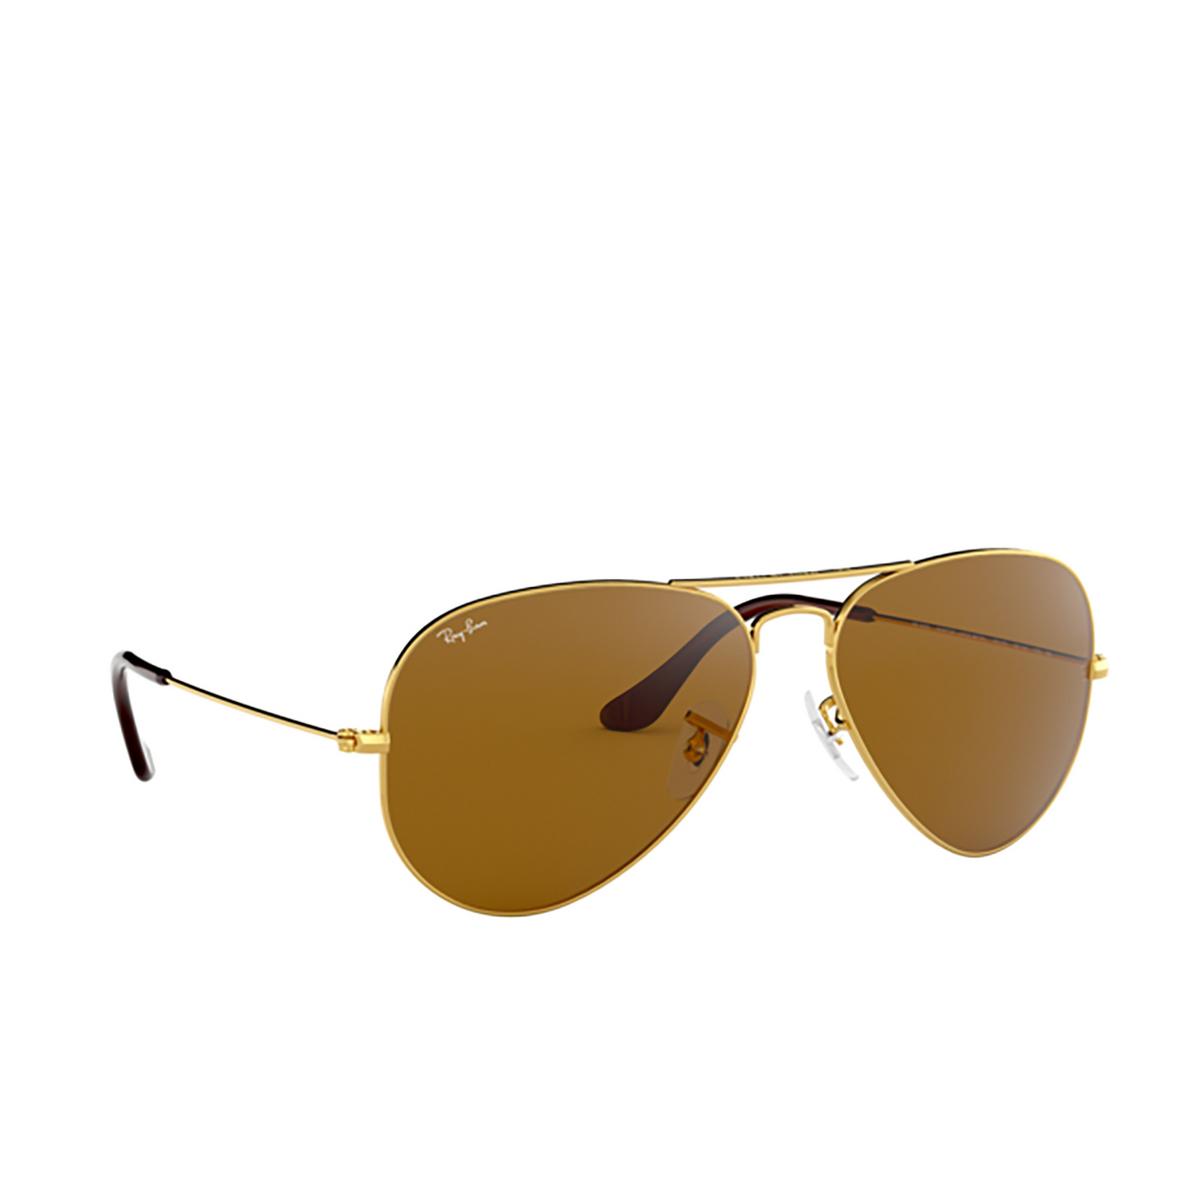 Ray-Ban® Aviator Sunglasses: Aviator Large Metal RB3025 color Arista 001/33 - three-quarters view.